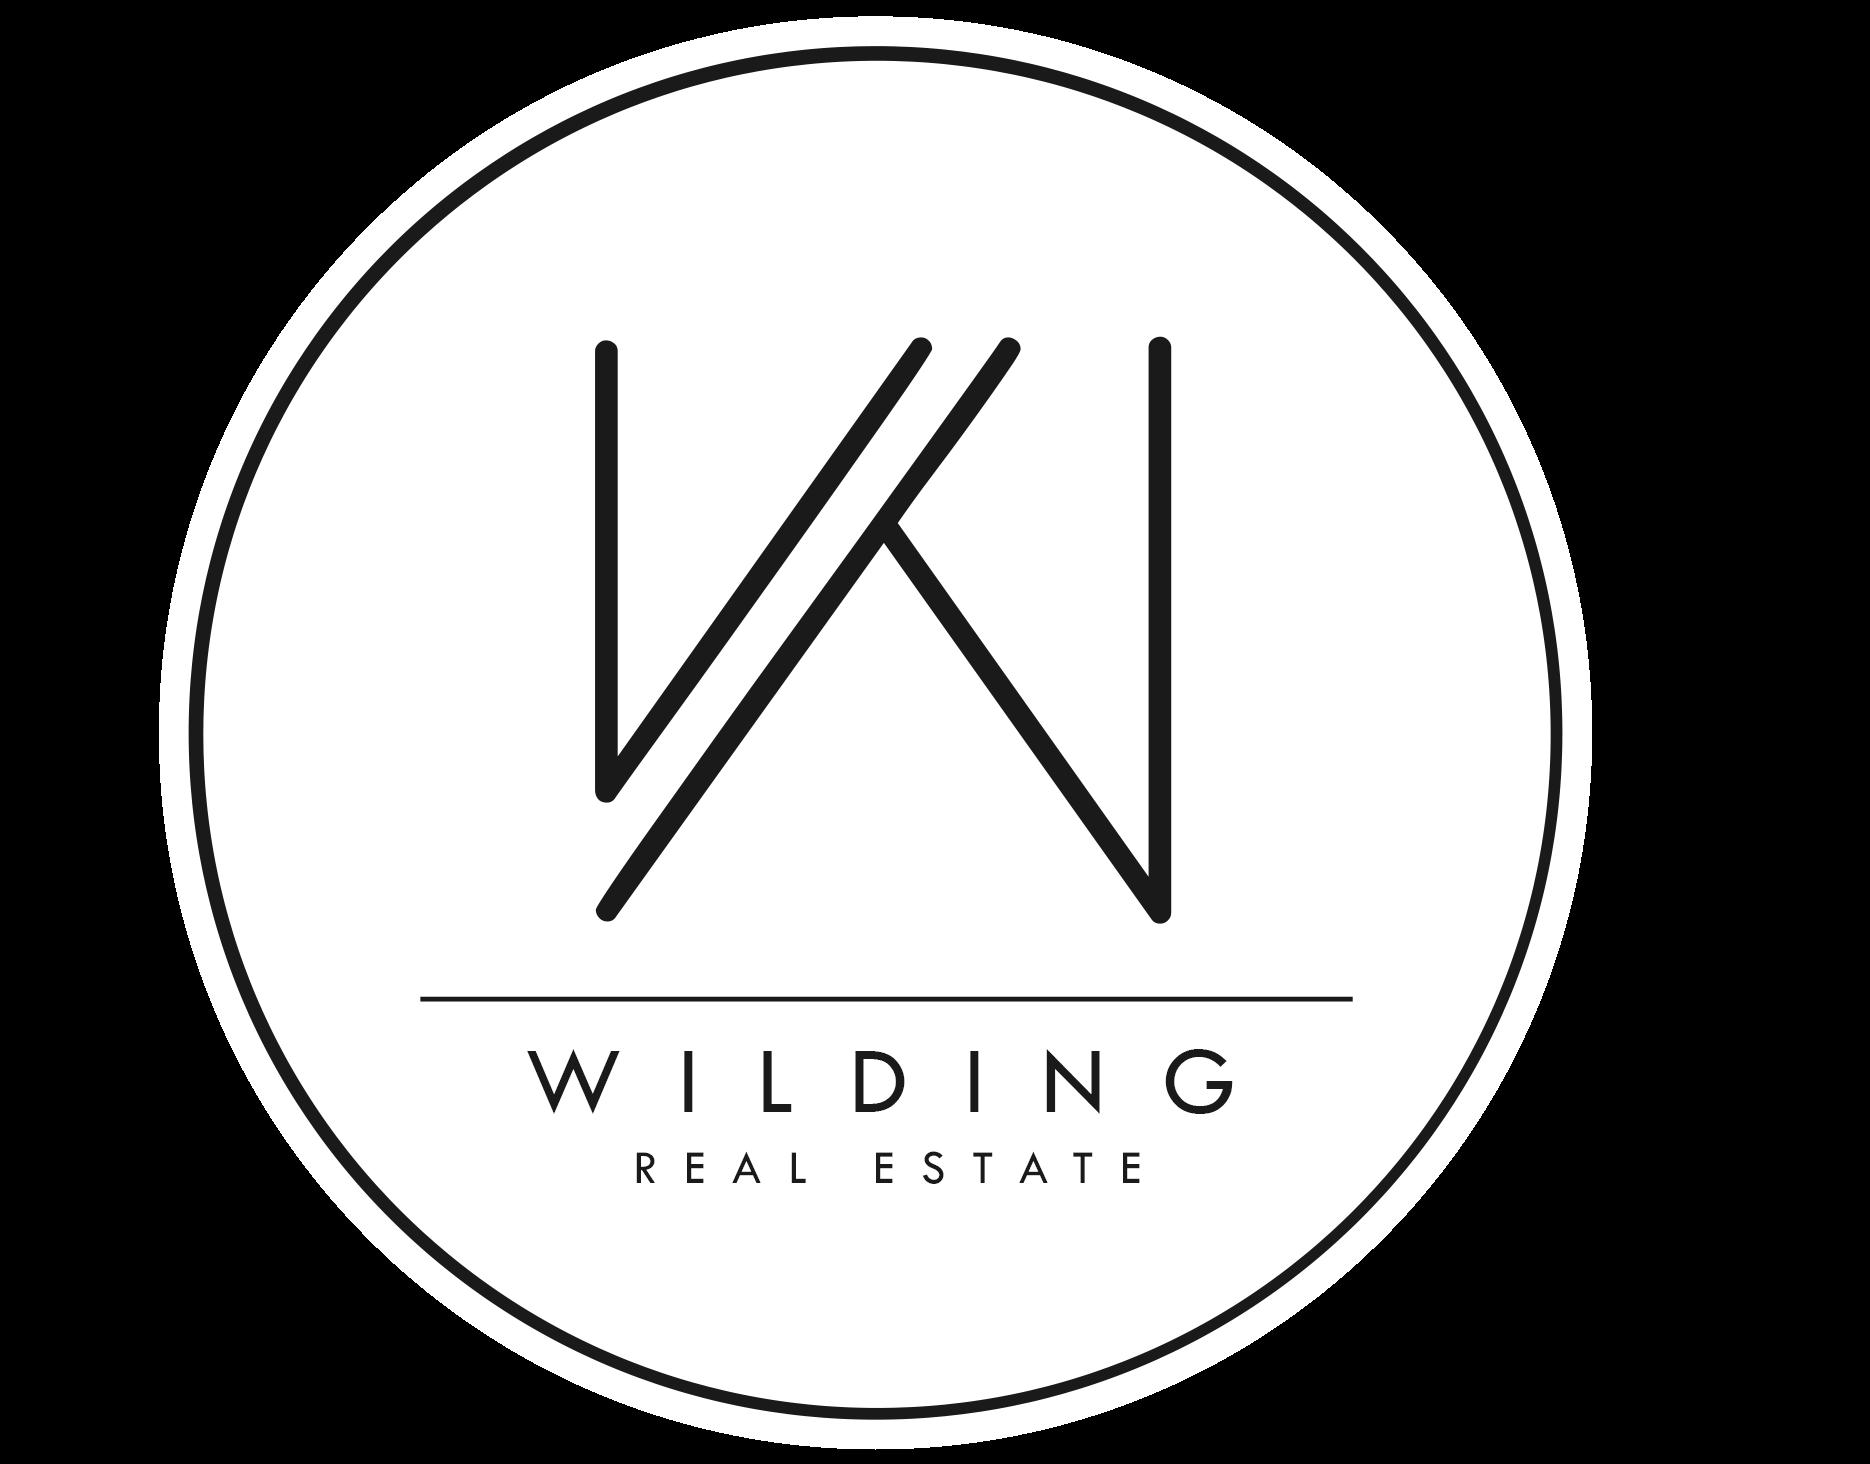 Wilding Real Estate